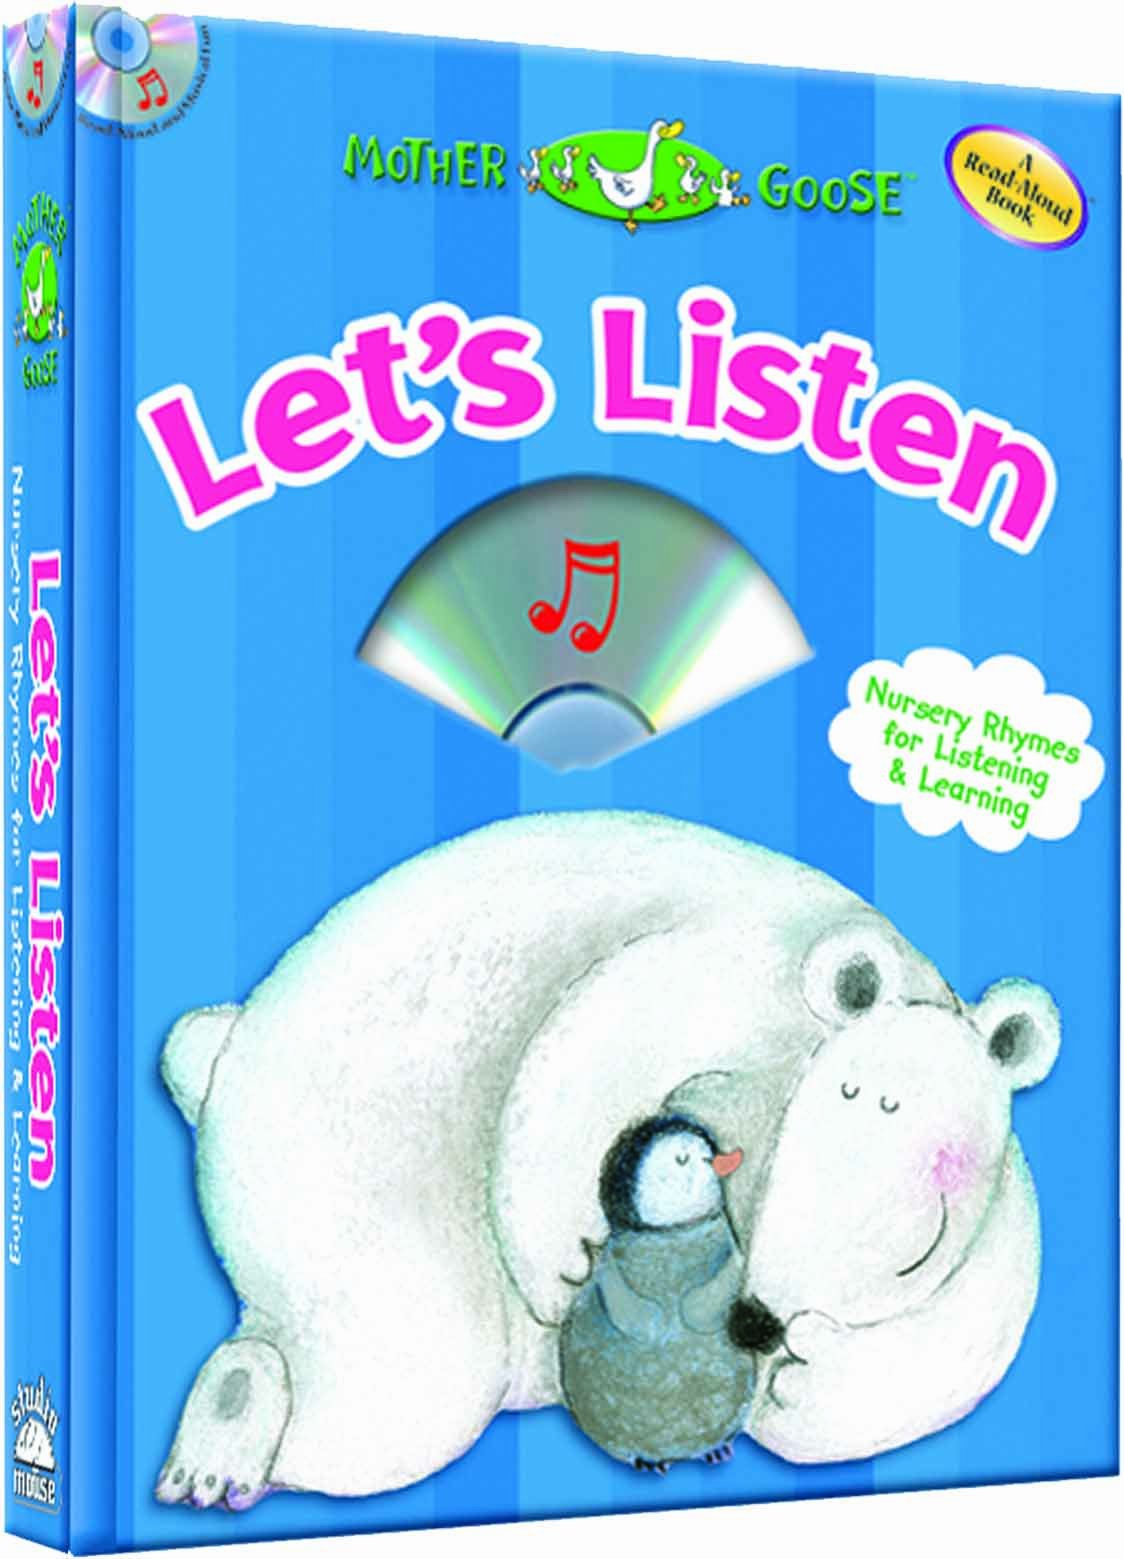 Download Let's Listen (Storybook Sets) (with audio CD) (Mother Goose) pdf